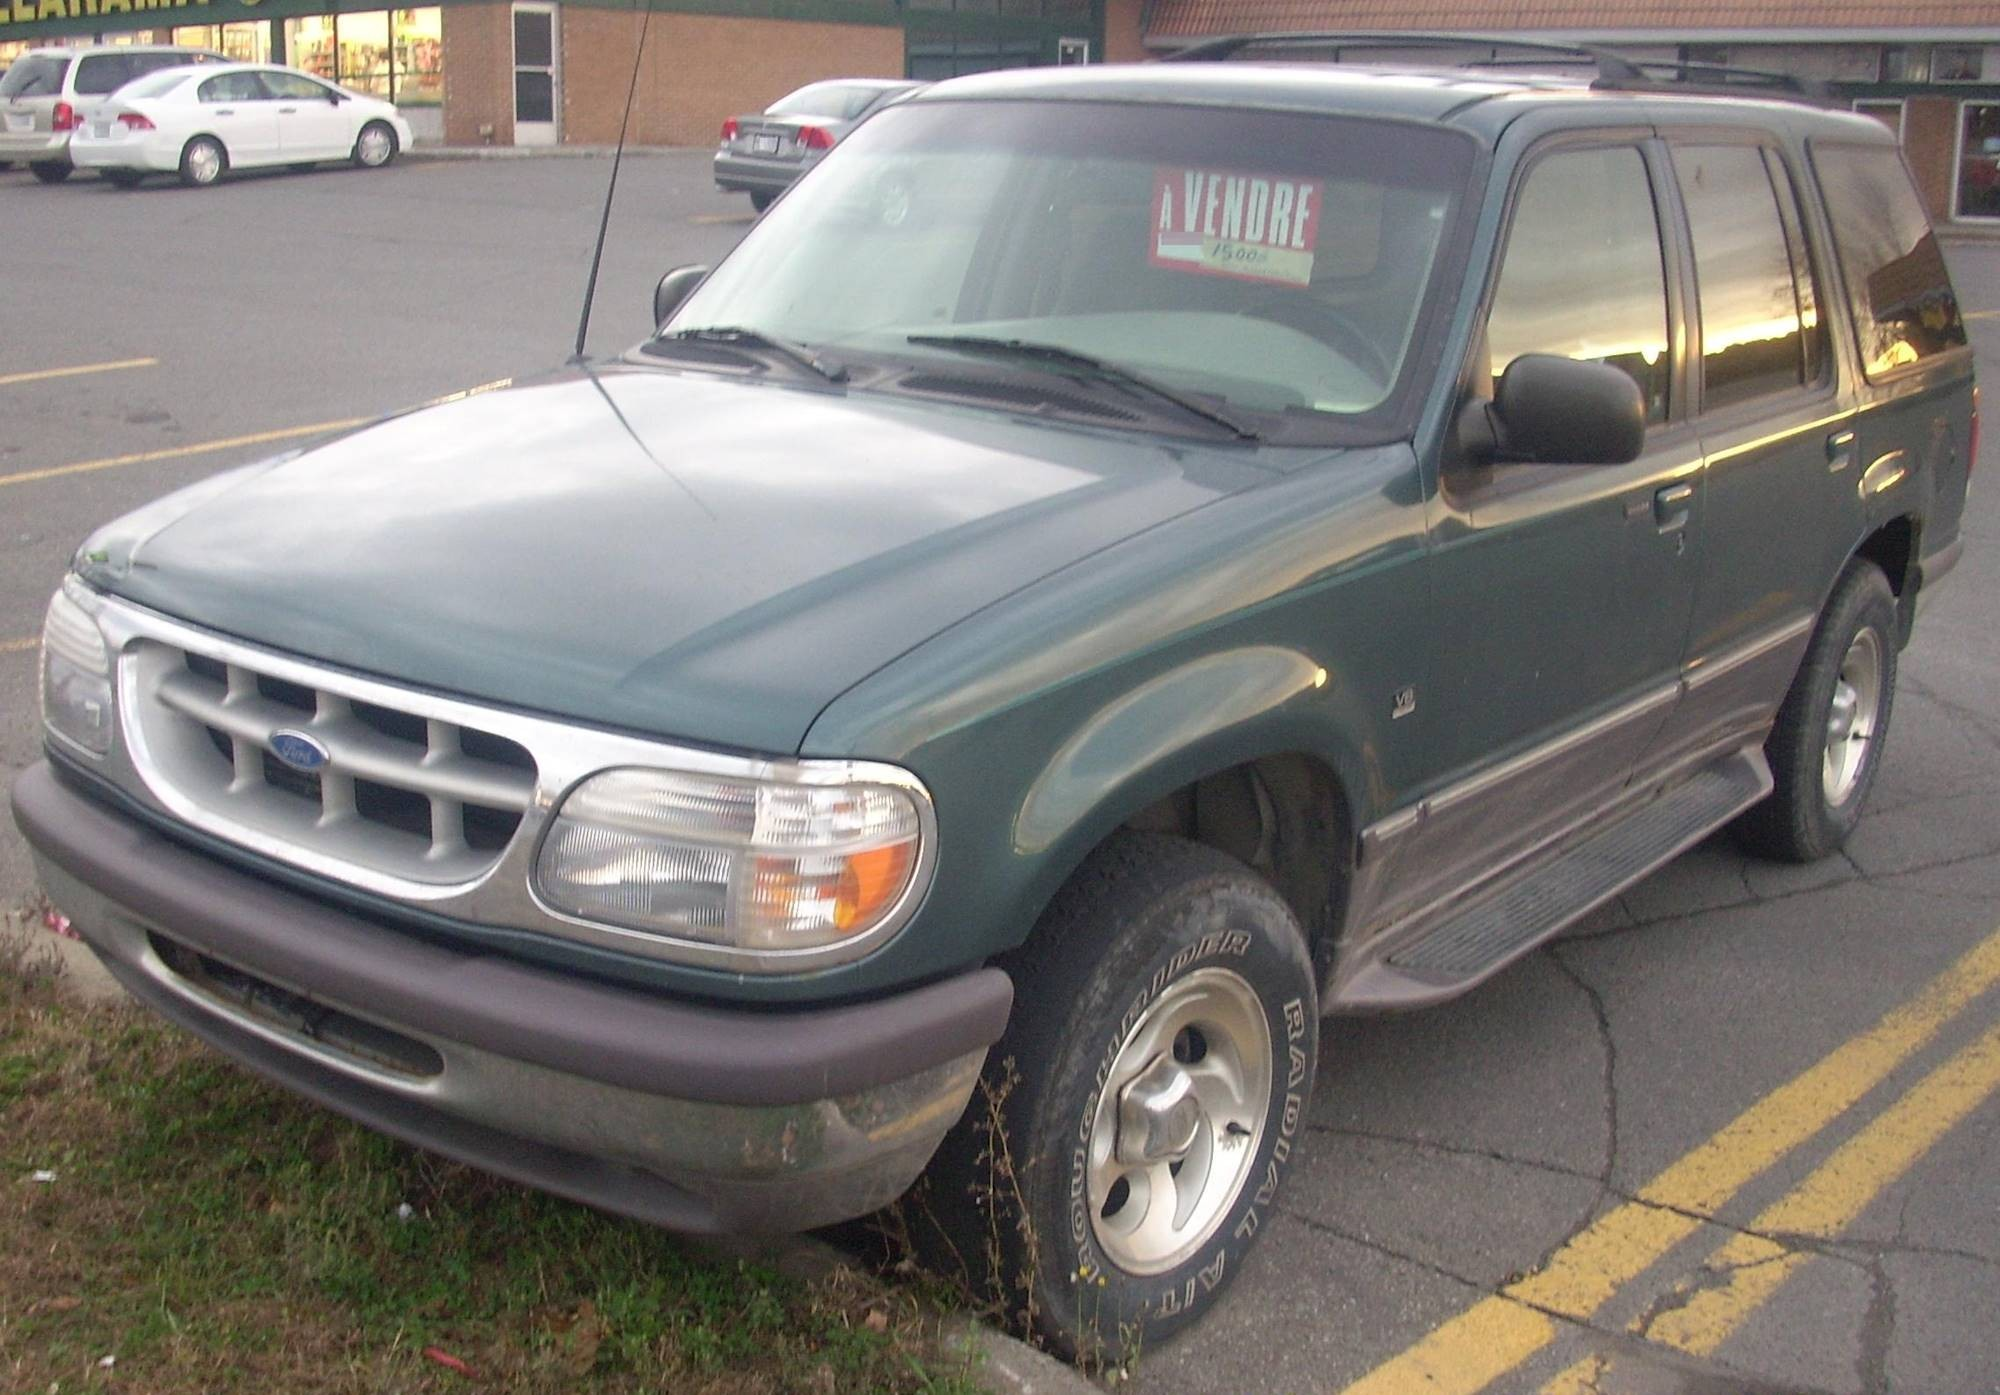 1996 ford Explorer Parts Diagram 1996 ford Explorer Xlt 4dr Suv 4 0l V6 Manual Of 1996 ford Explorer Parts Diagram